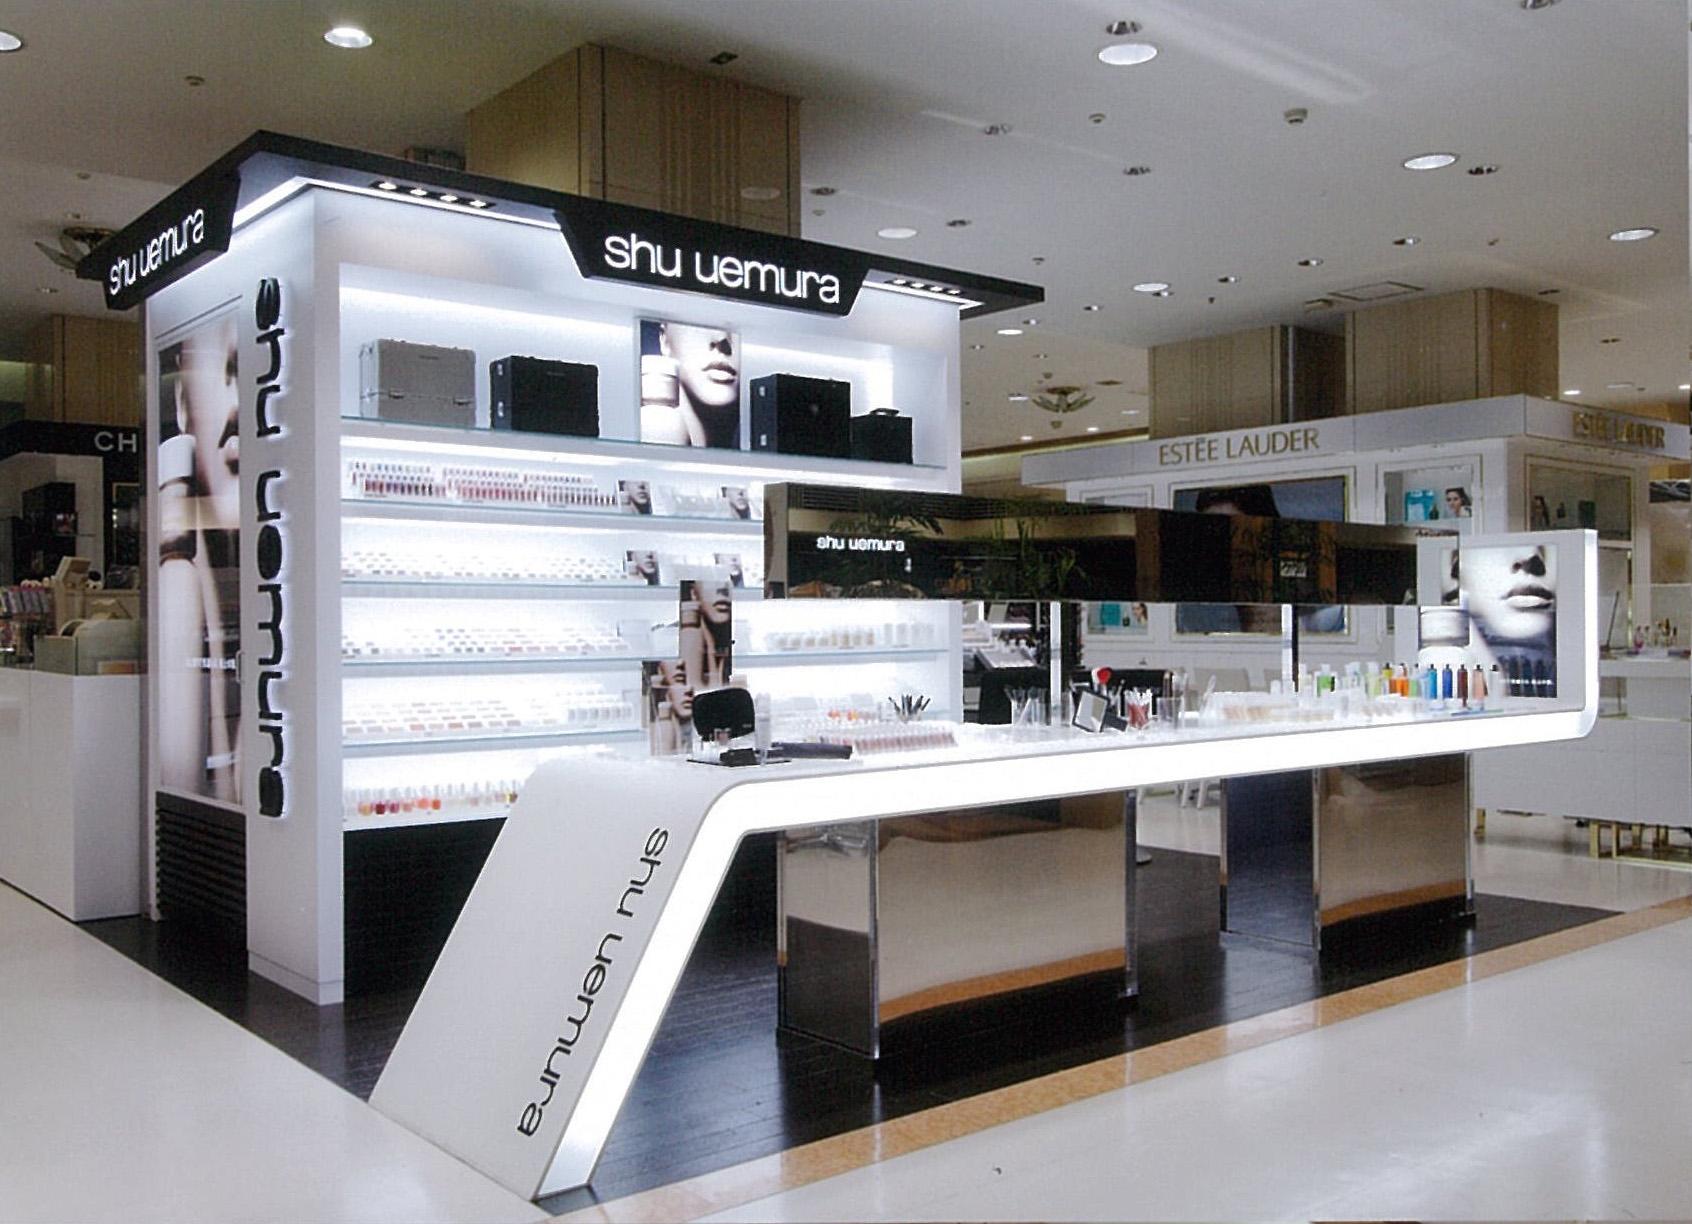 shuuemura SHOP 国内店舗 〜2010 店舗展開|設計・デザイン事例詳細 ...